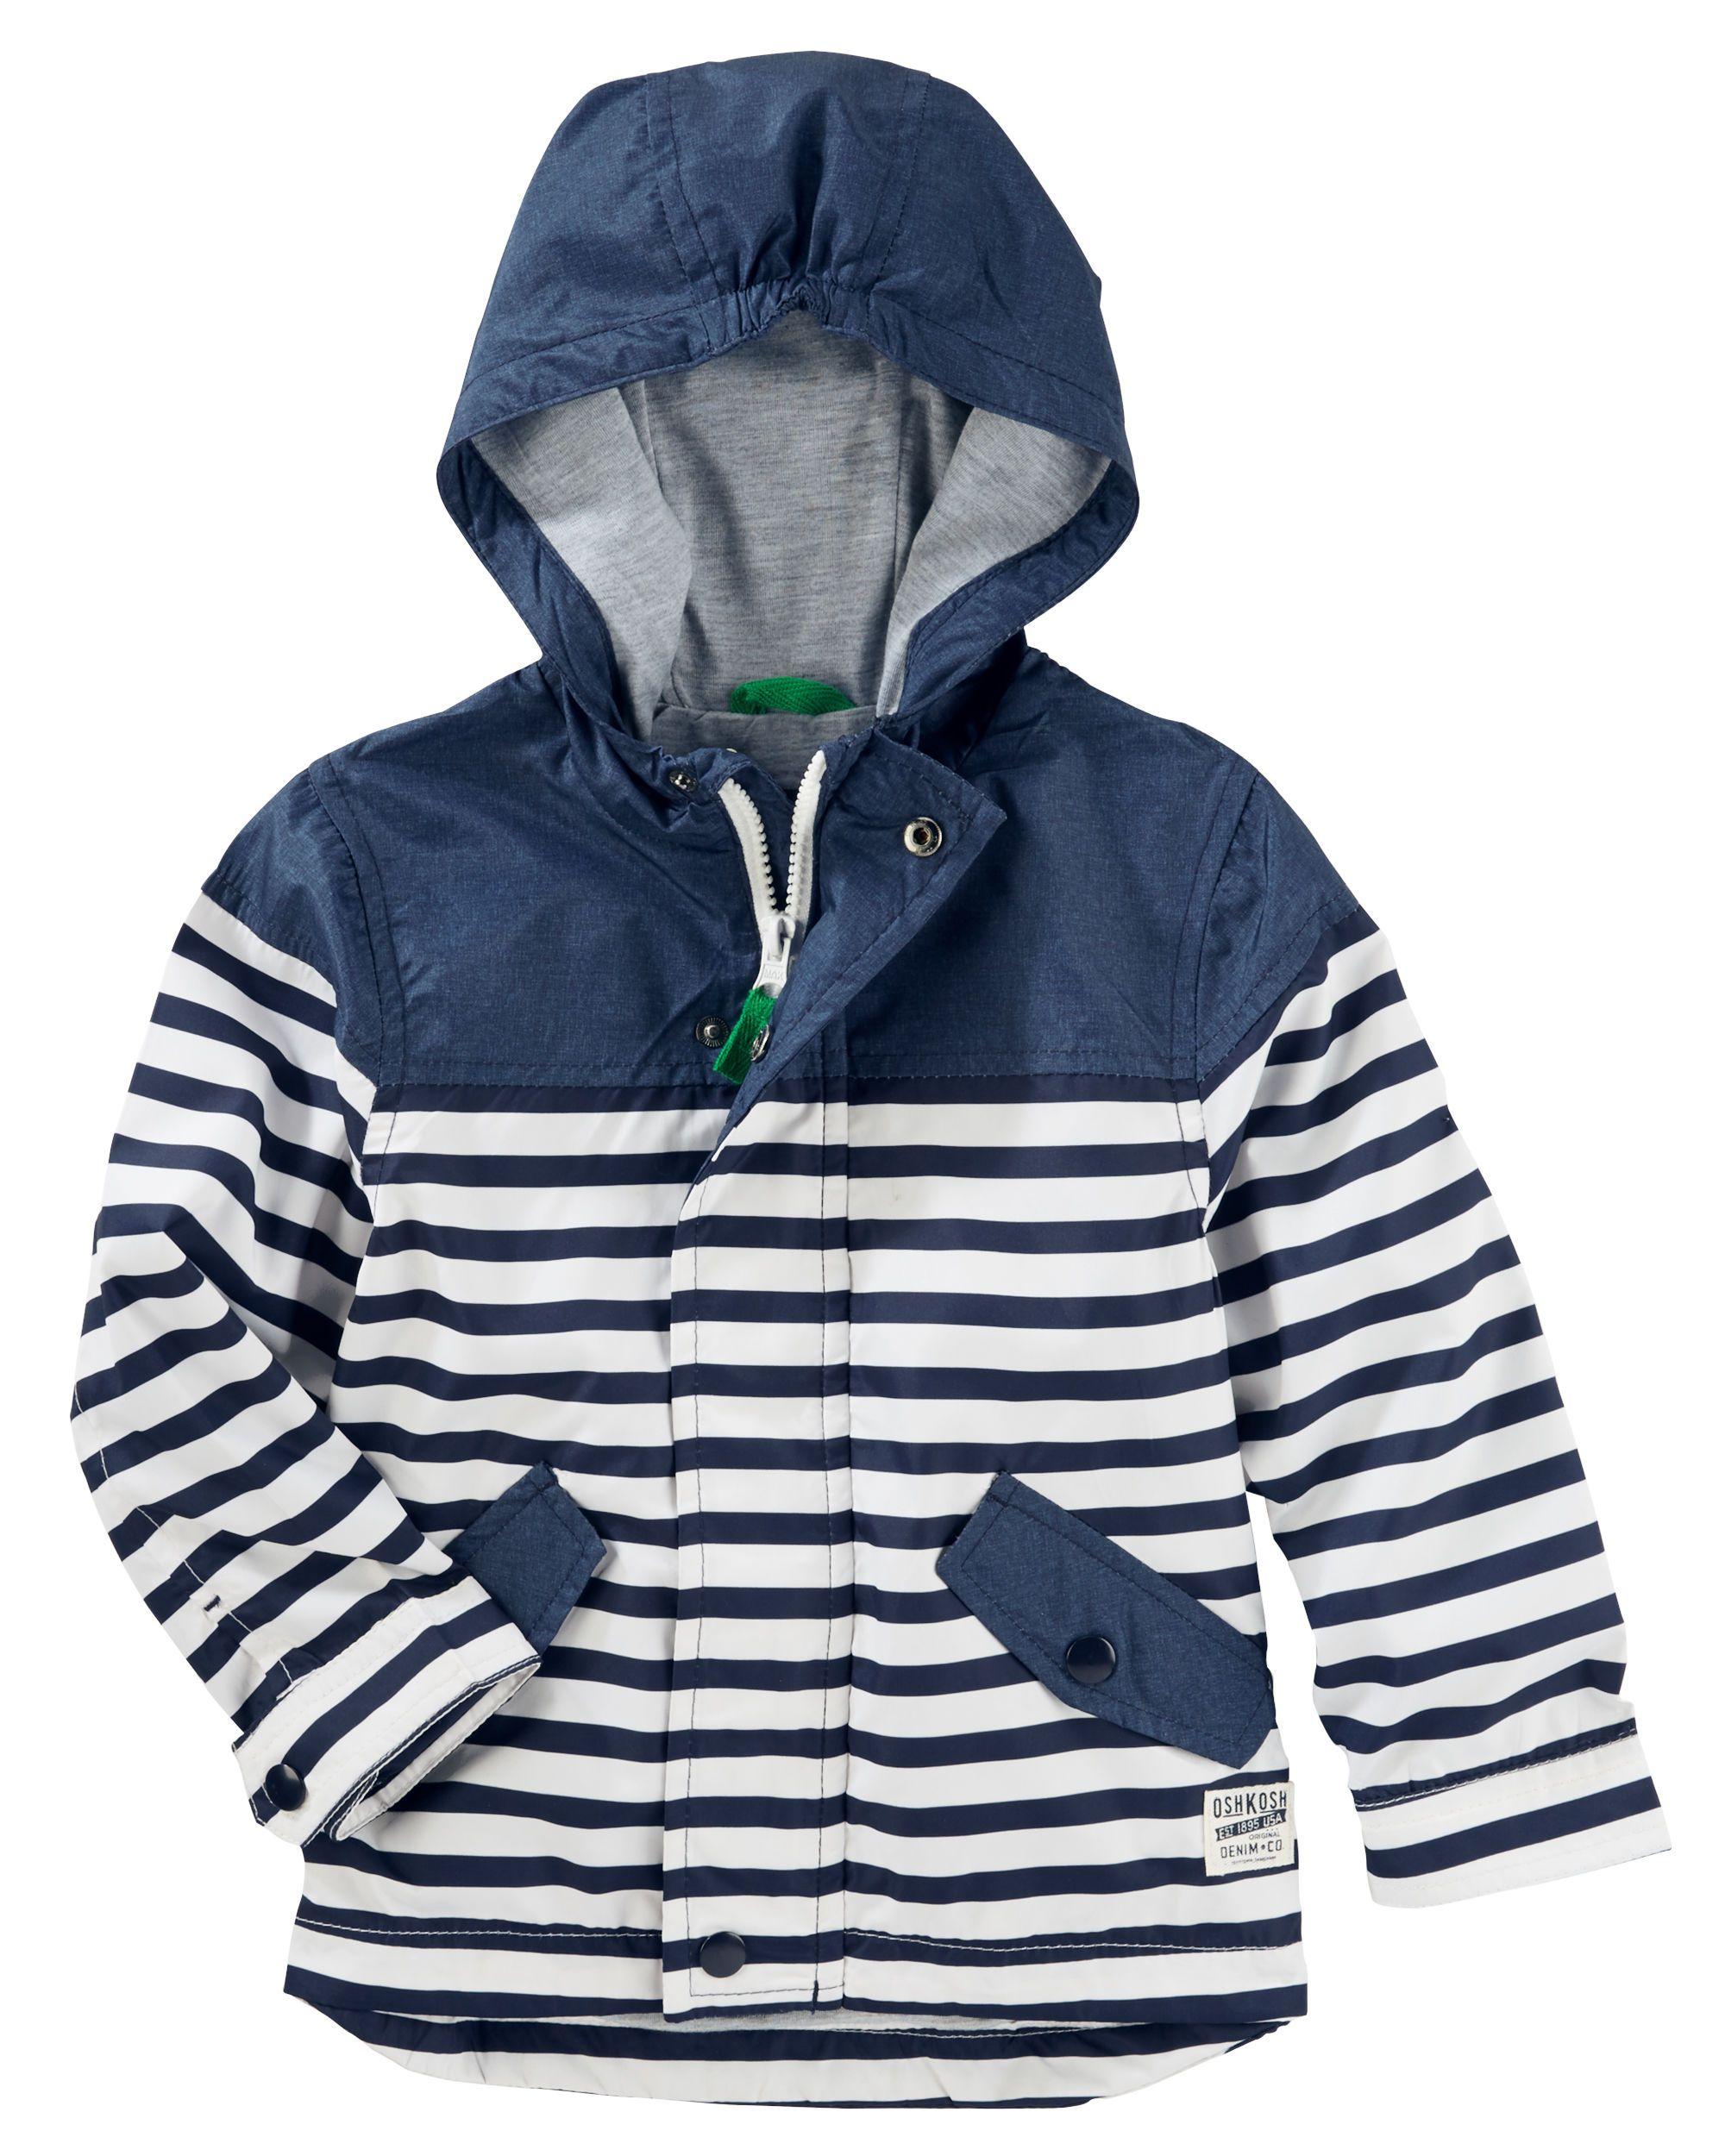 baa86b18 Lightweight Striped Windbreaker | NIELS CALDER | Spring jackets ...